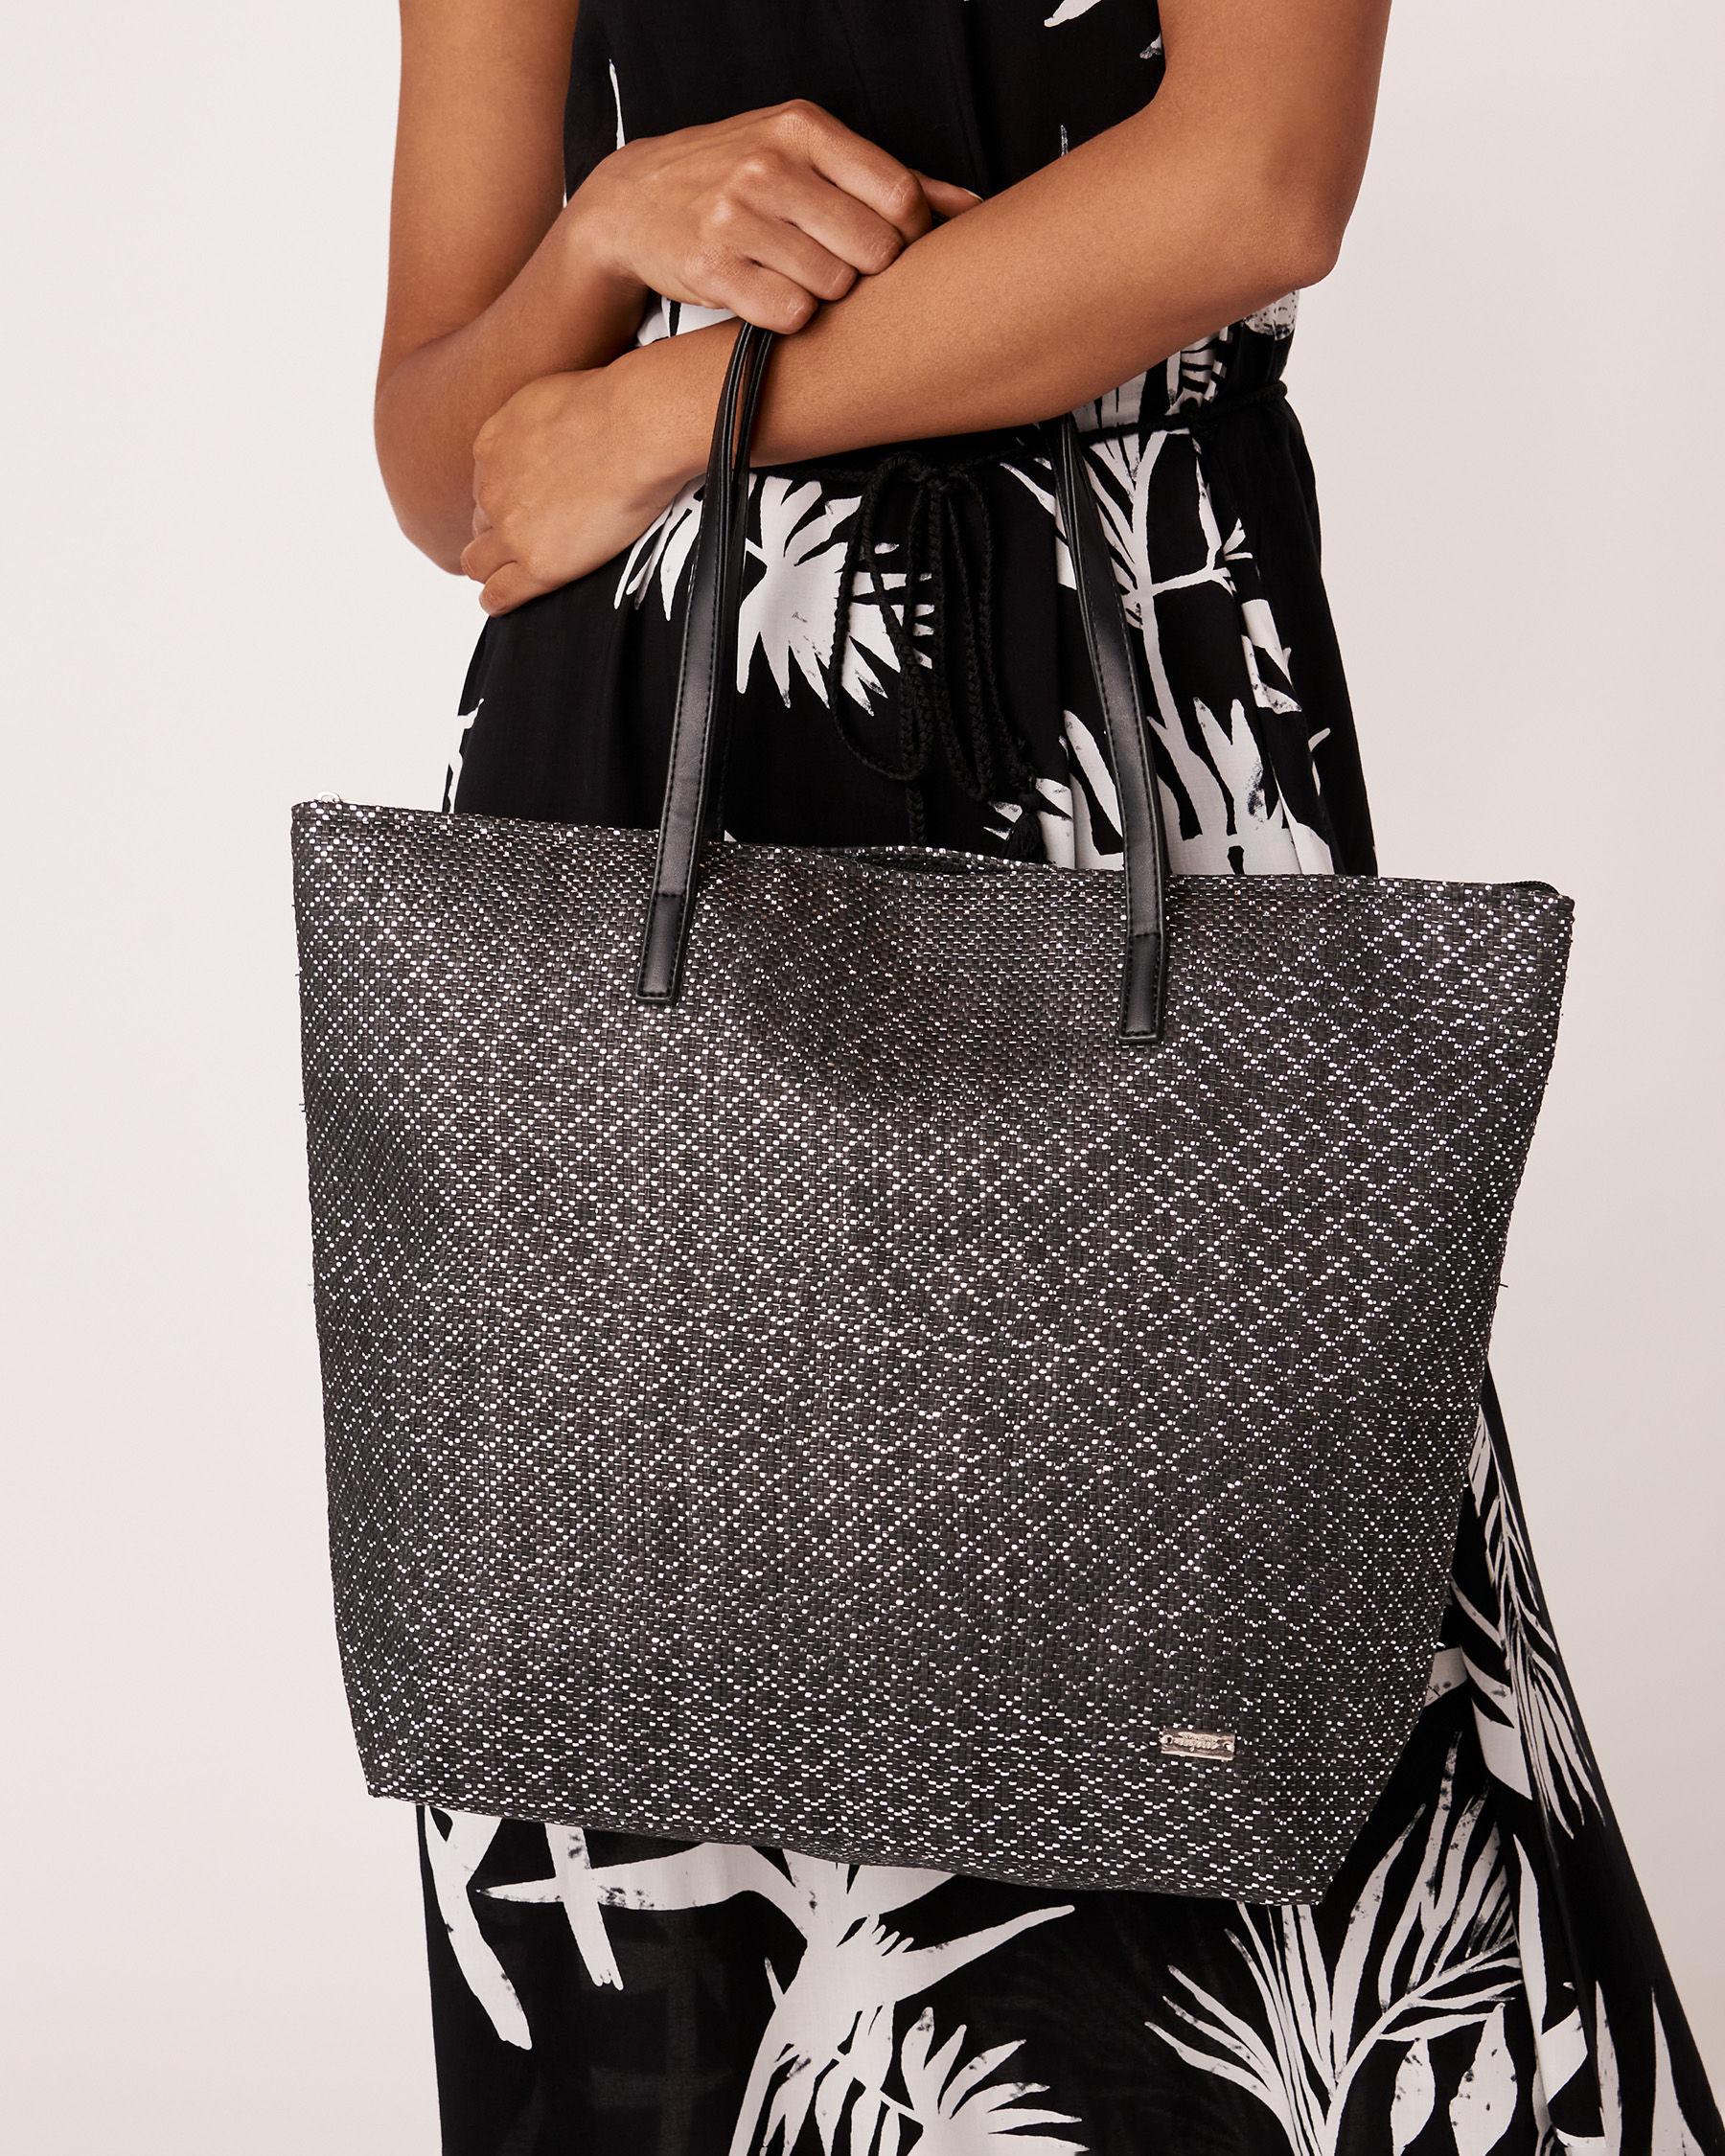 LA VIE EN ROSE AQUA Shiny Black Beach Bag Black 636-661-0-11 - View1